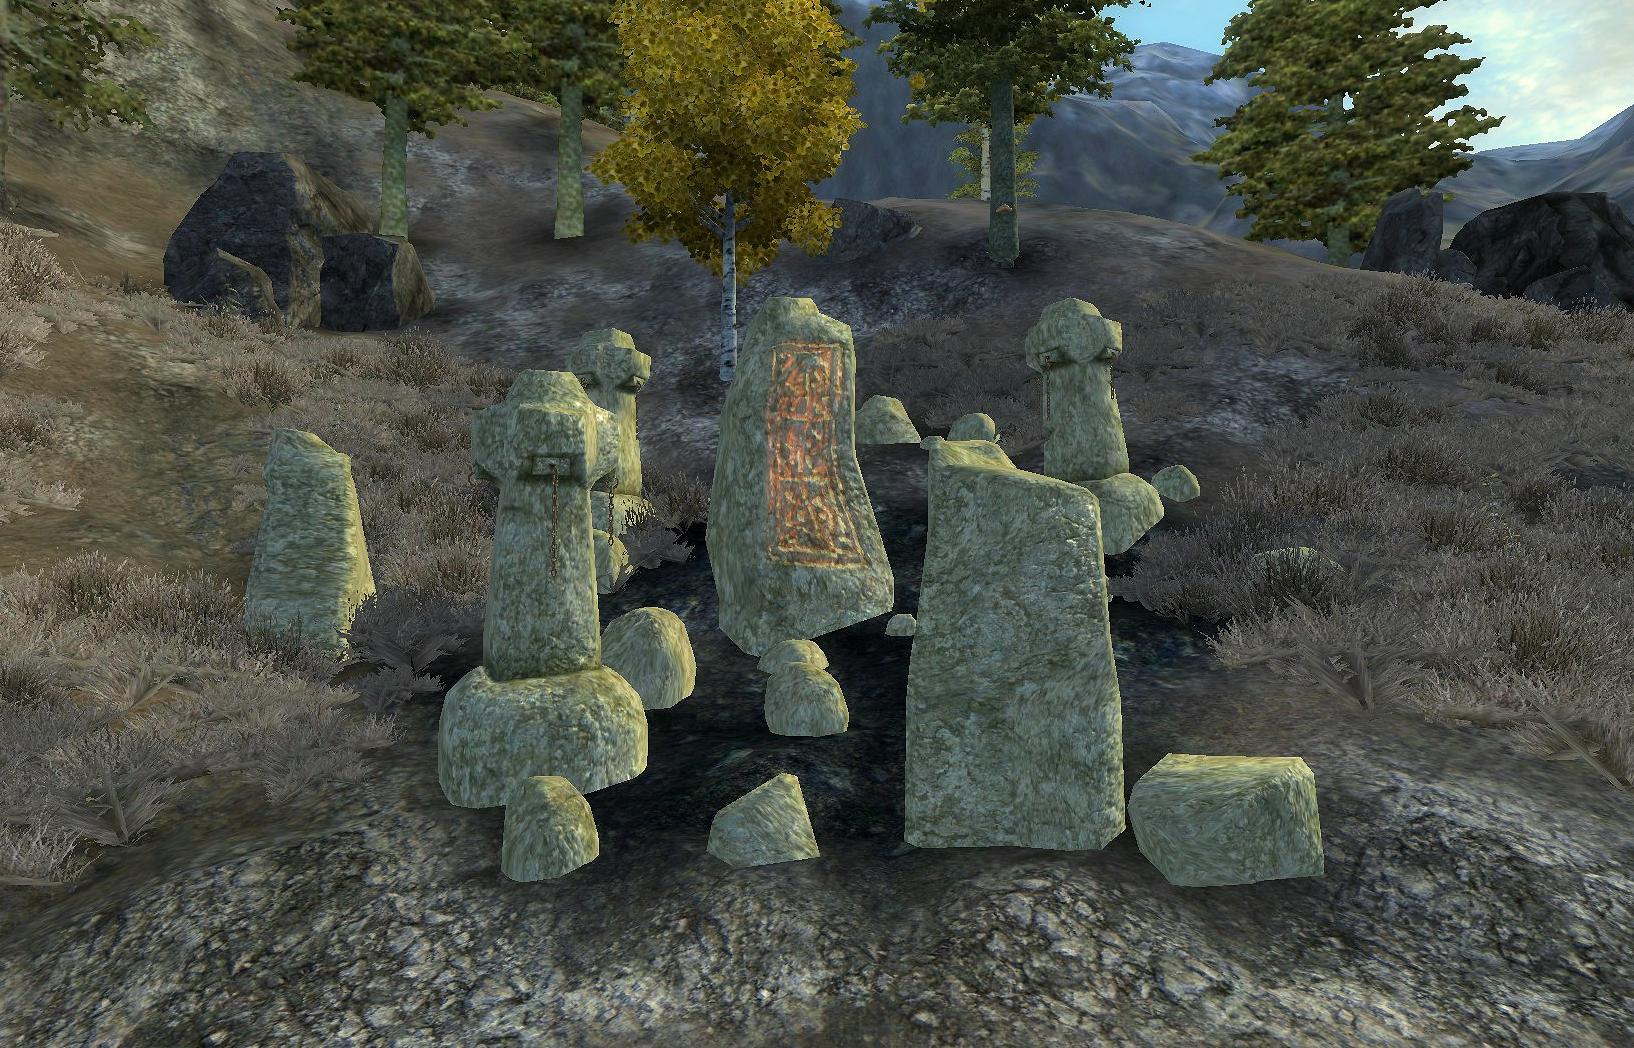 dragon stone elder scrolls fandom powered by wikia